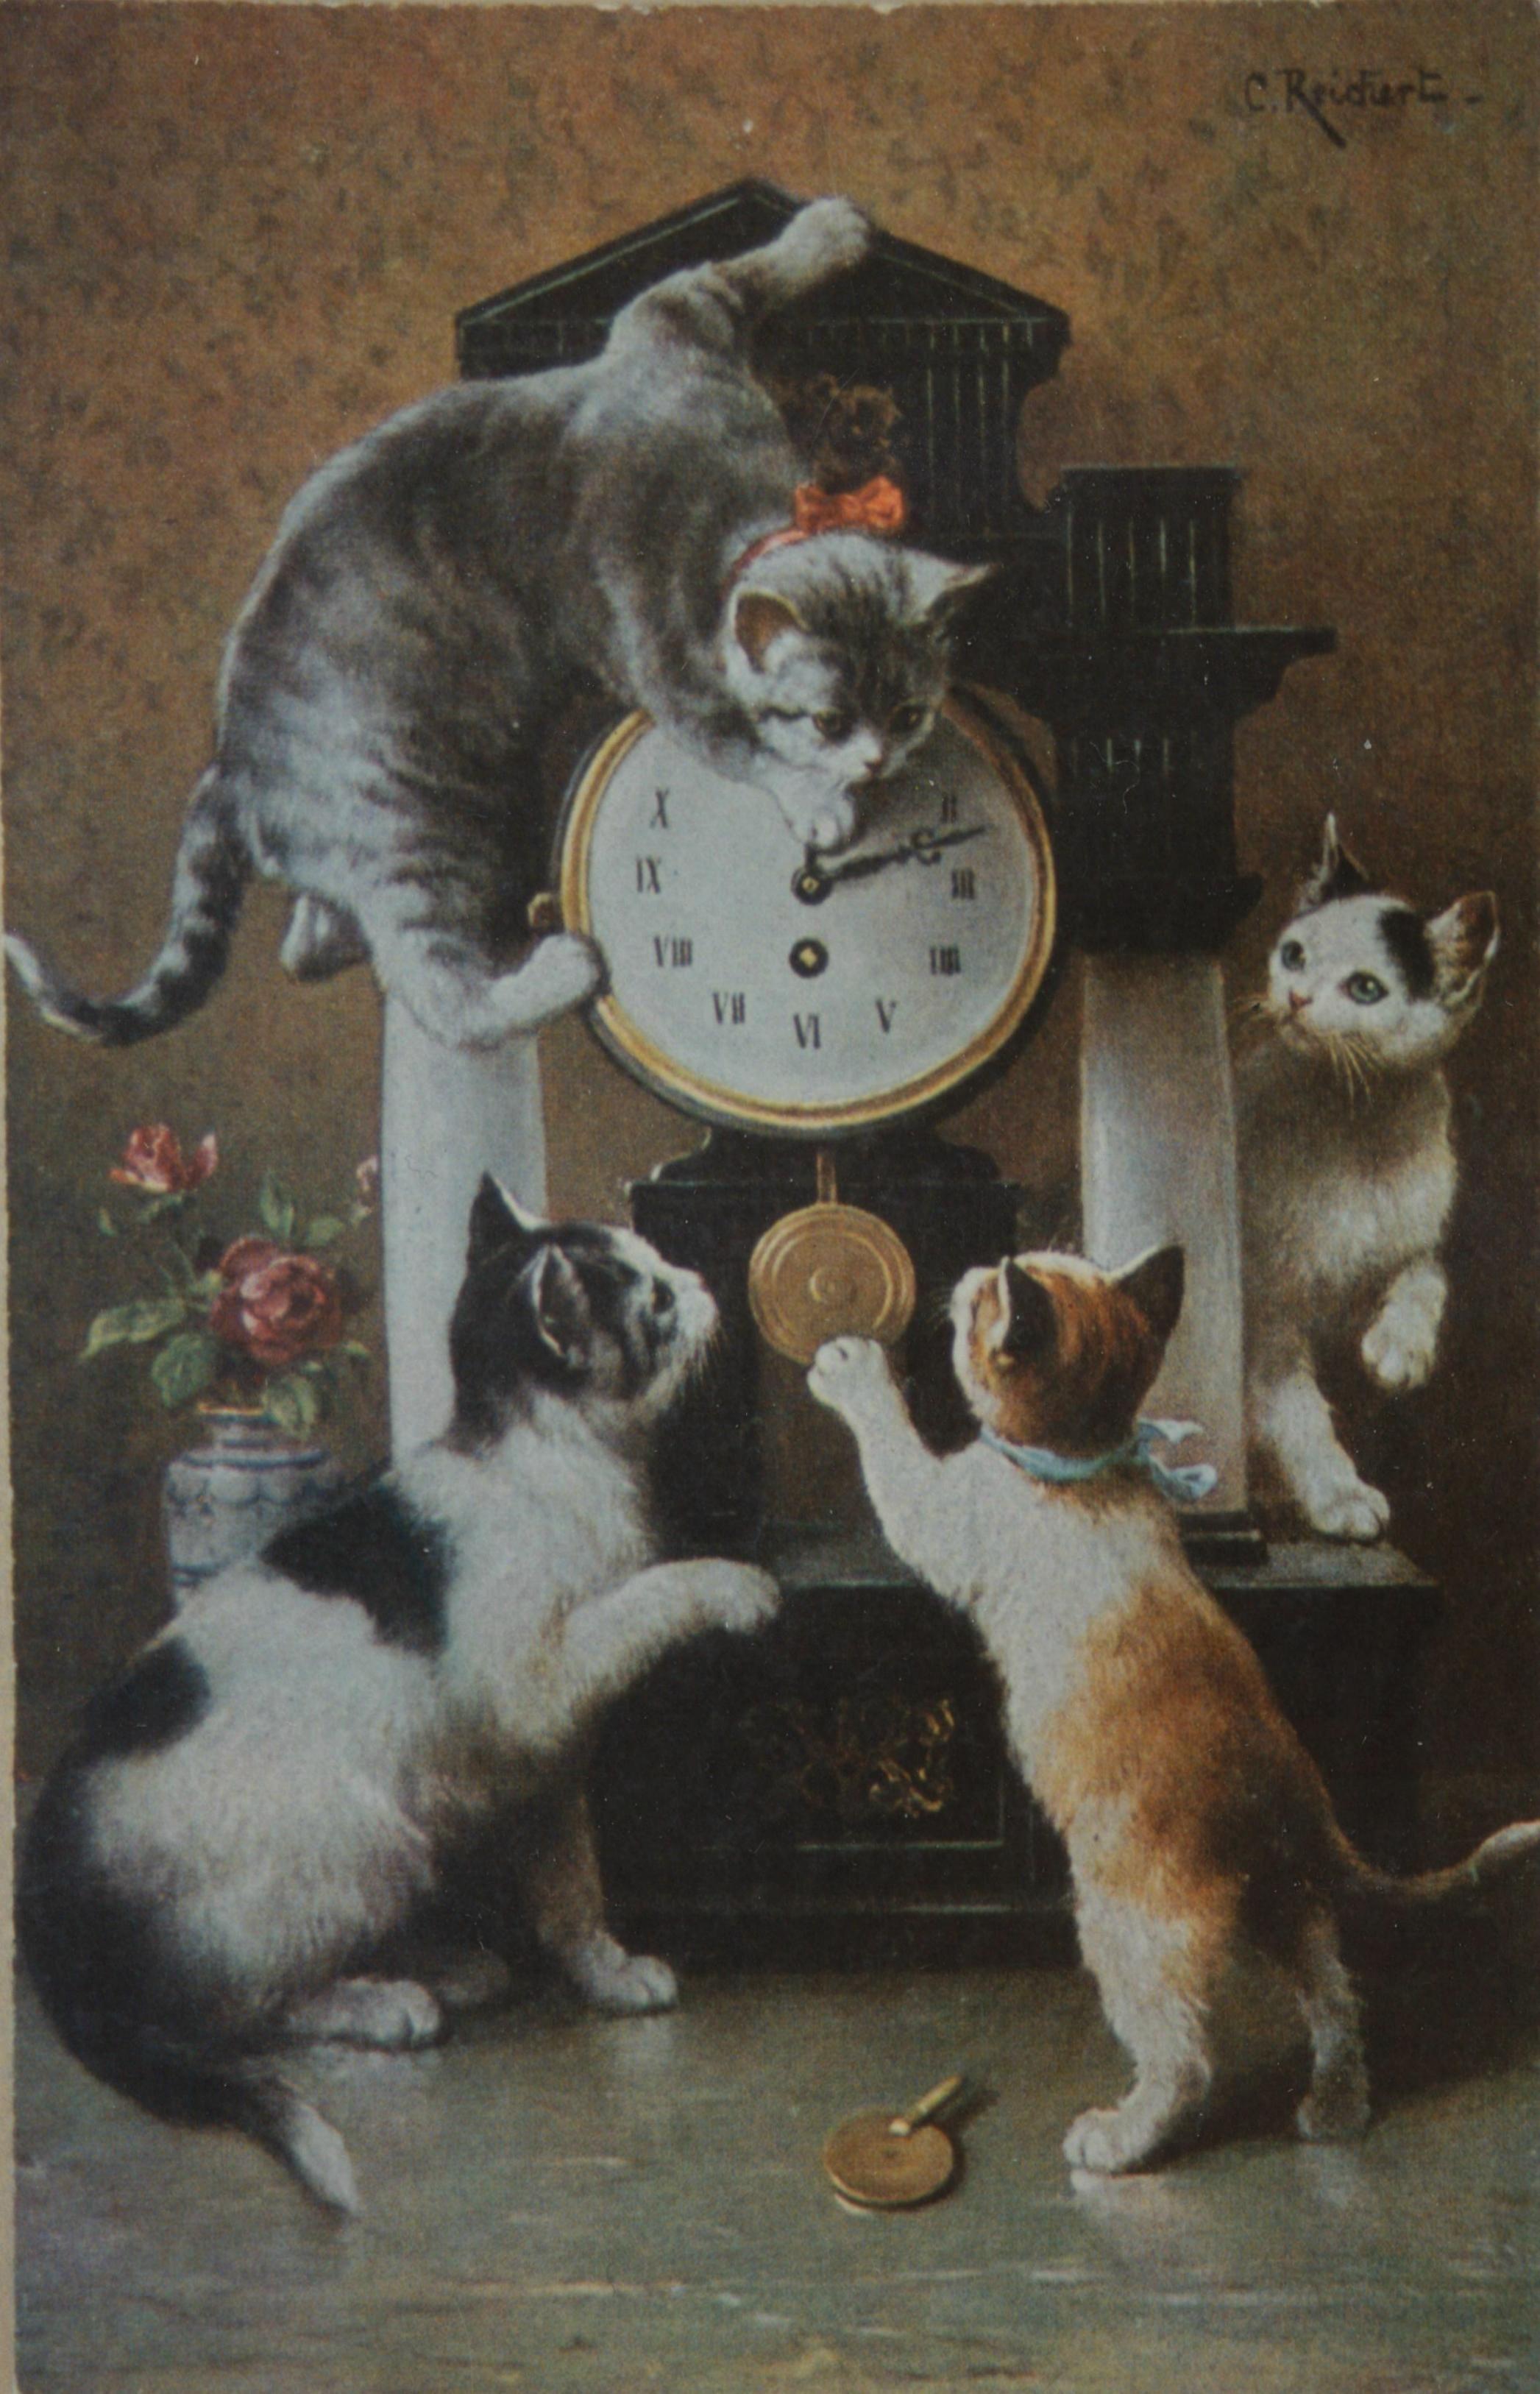 Pc Poezen Klok C Reichert 1910 5331428236 O Cats Kittens Cat Kitten Vintage Retro Feline Photo Art Cats Illustration Cat Painting Cat Art